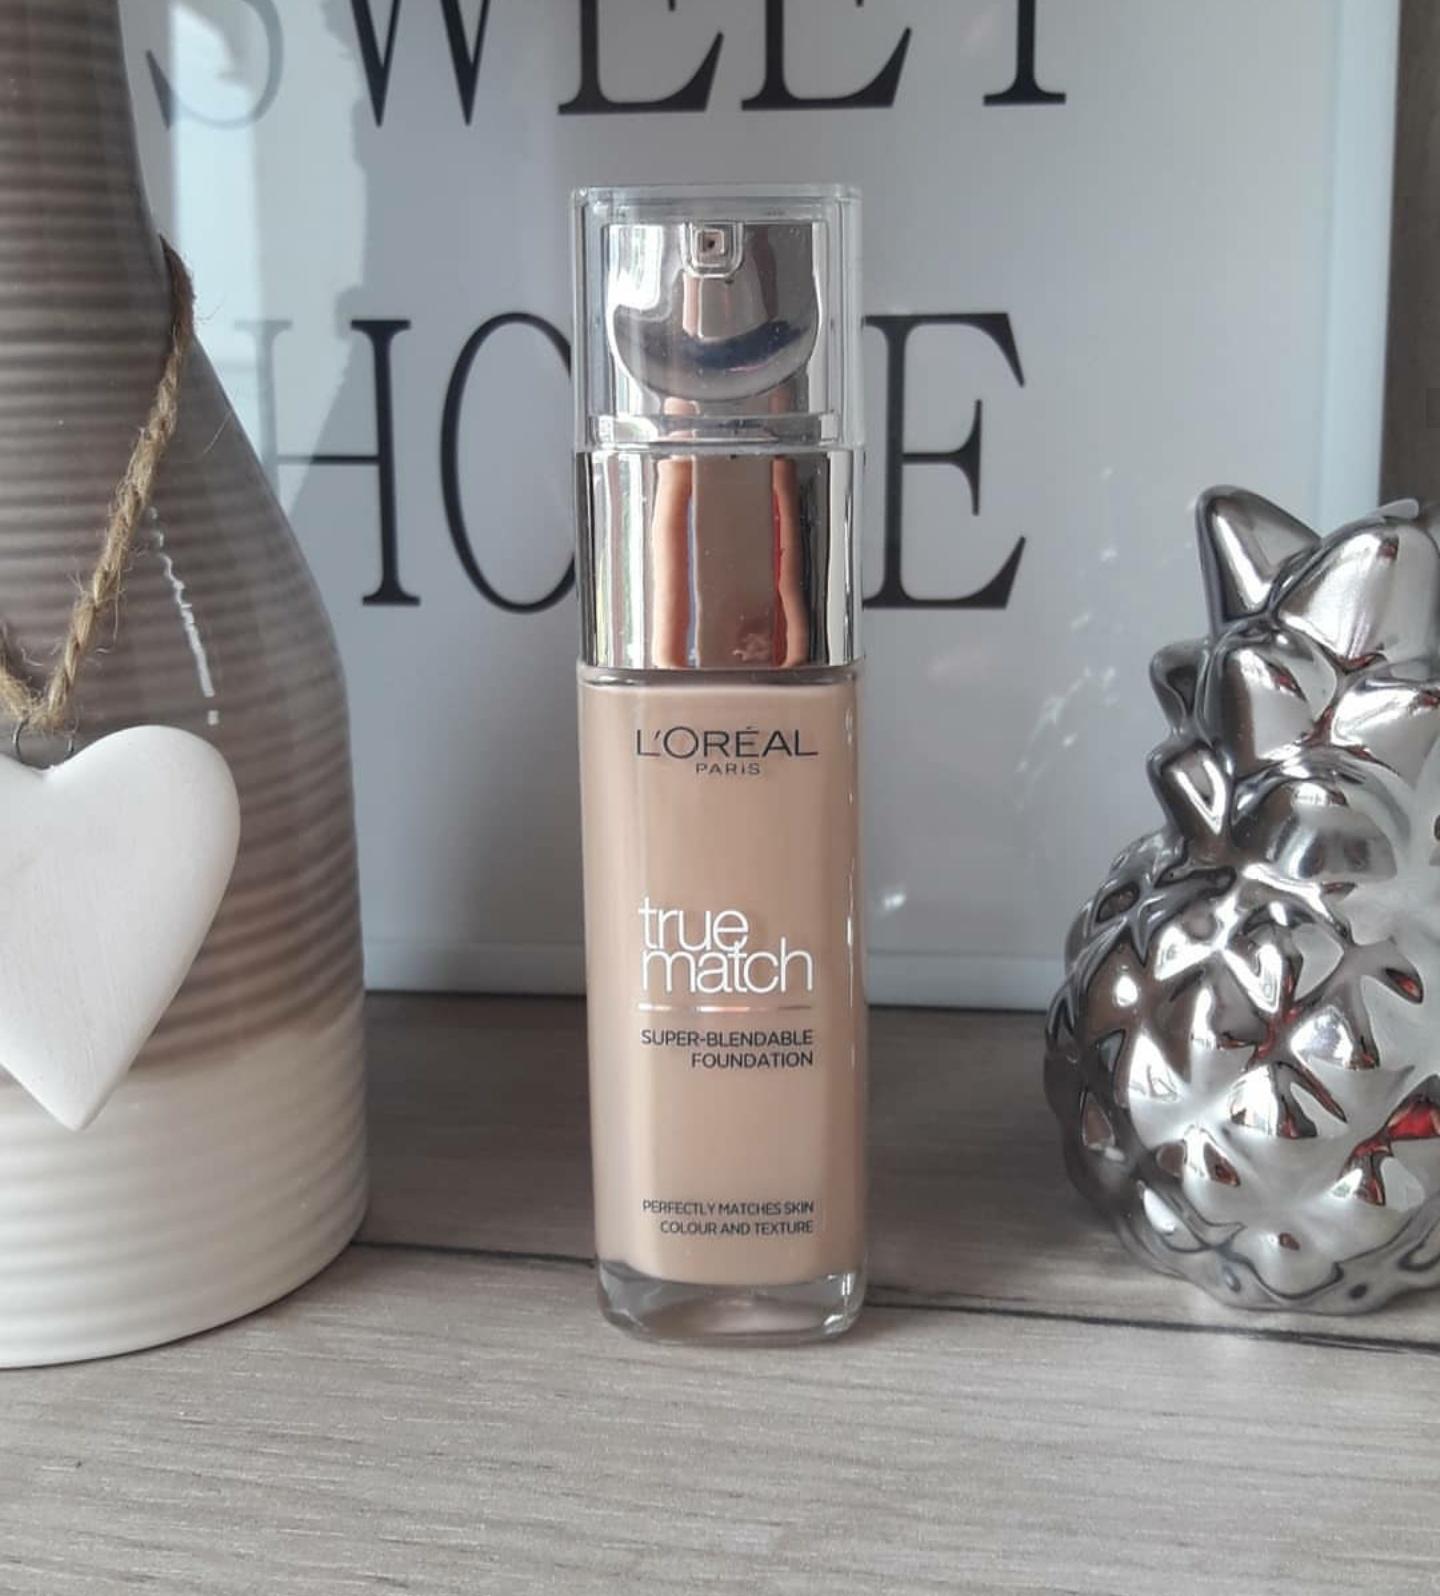 L'oreal Paris True Match Super Blendable Makeup Liquid Foundation-Medium coverage blendable foundation-By garima.sharma28-3